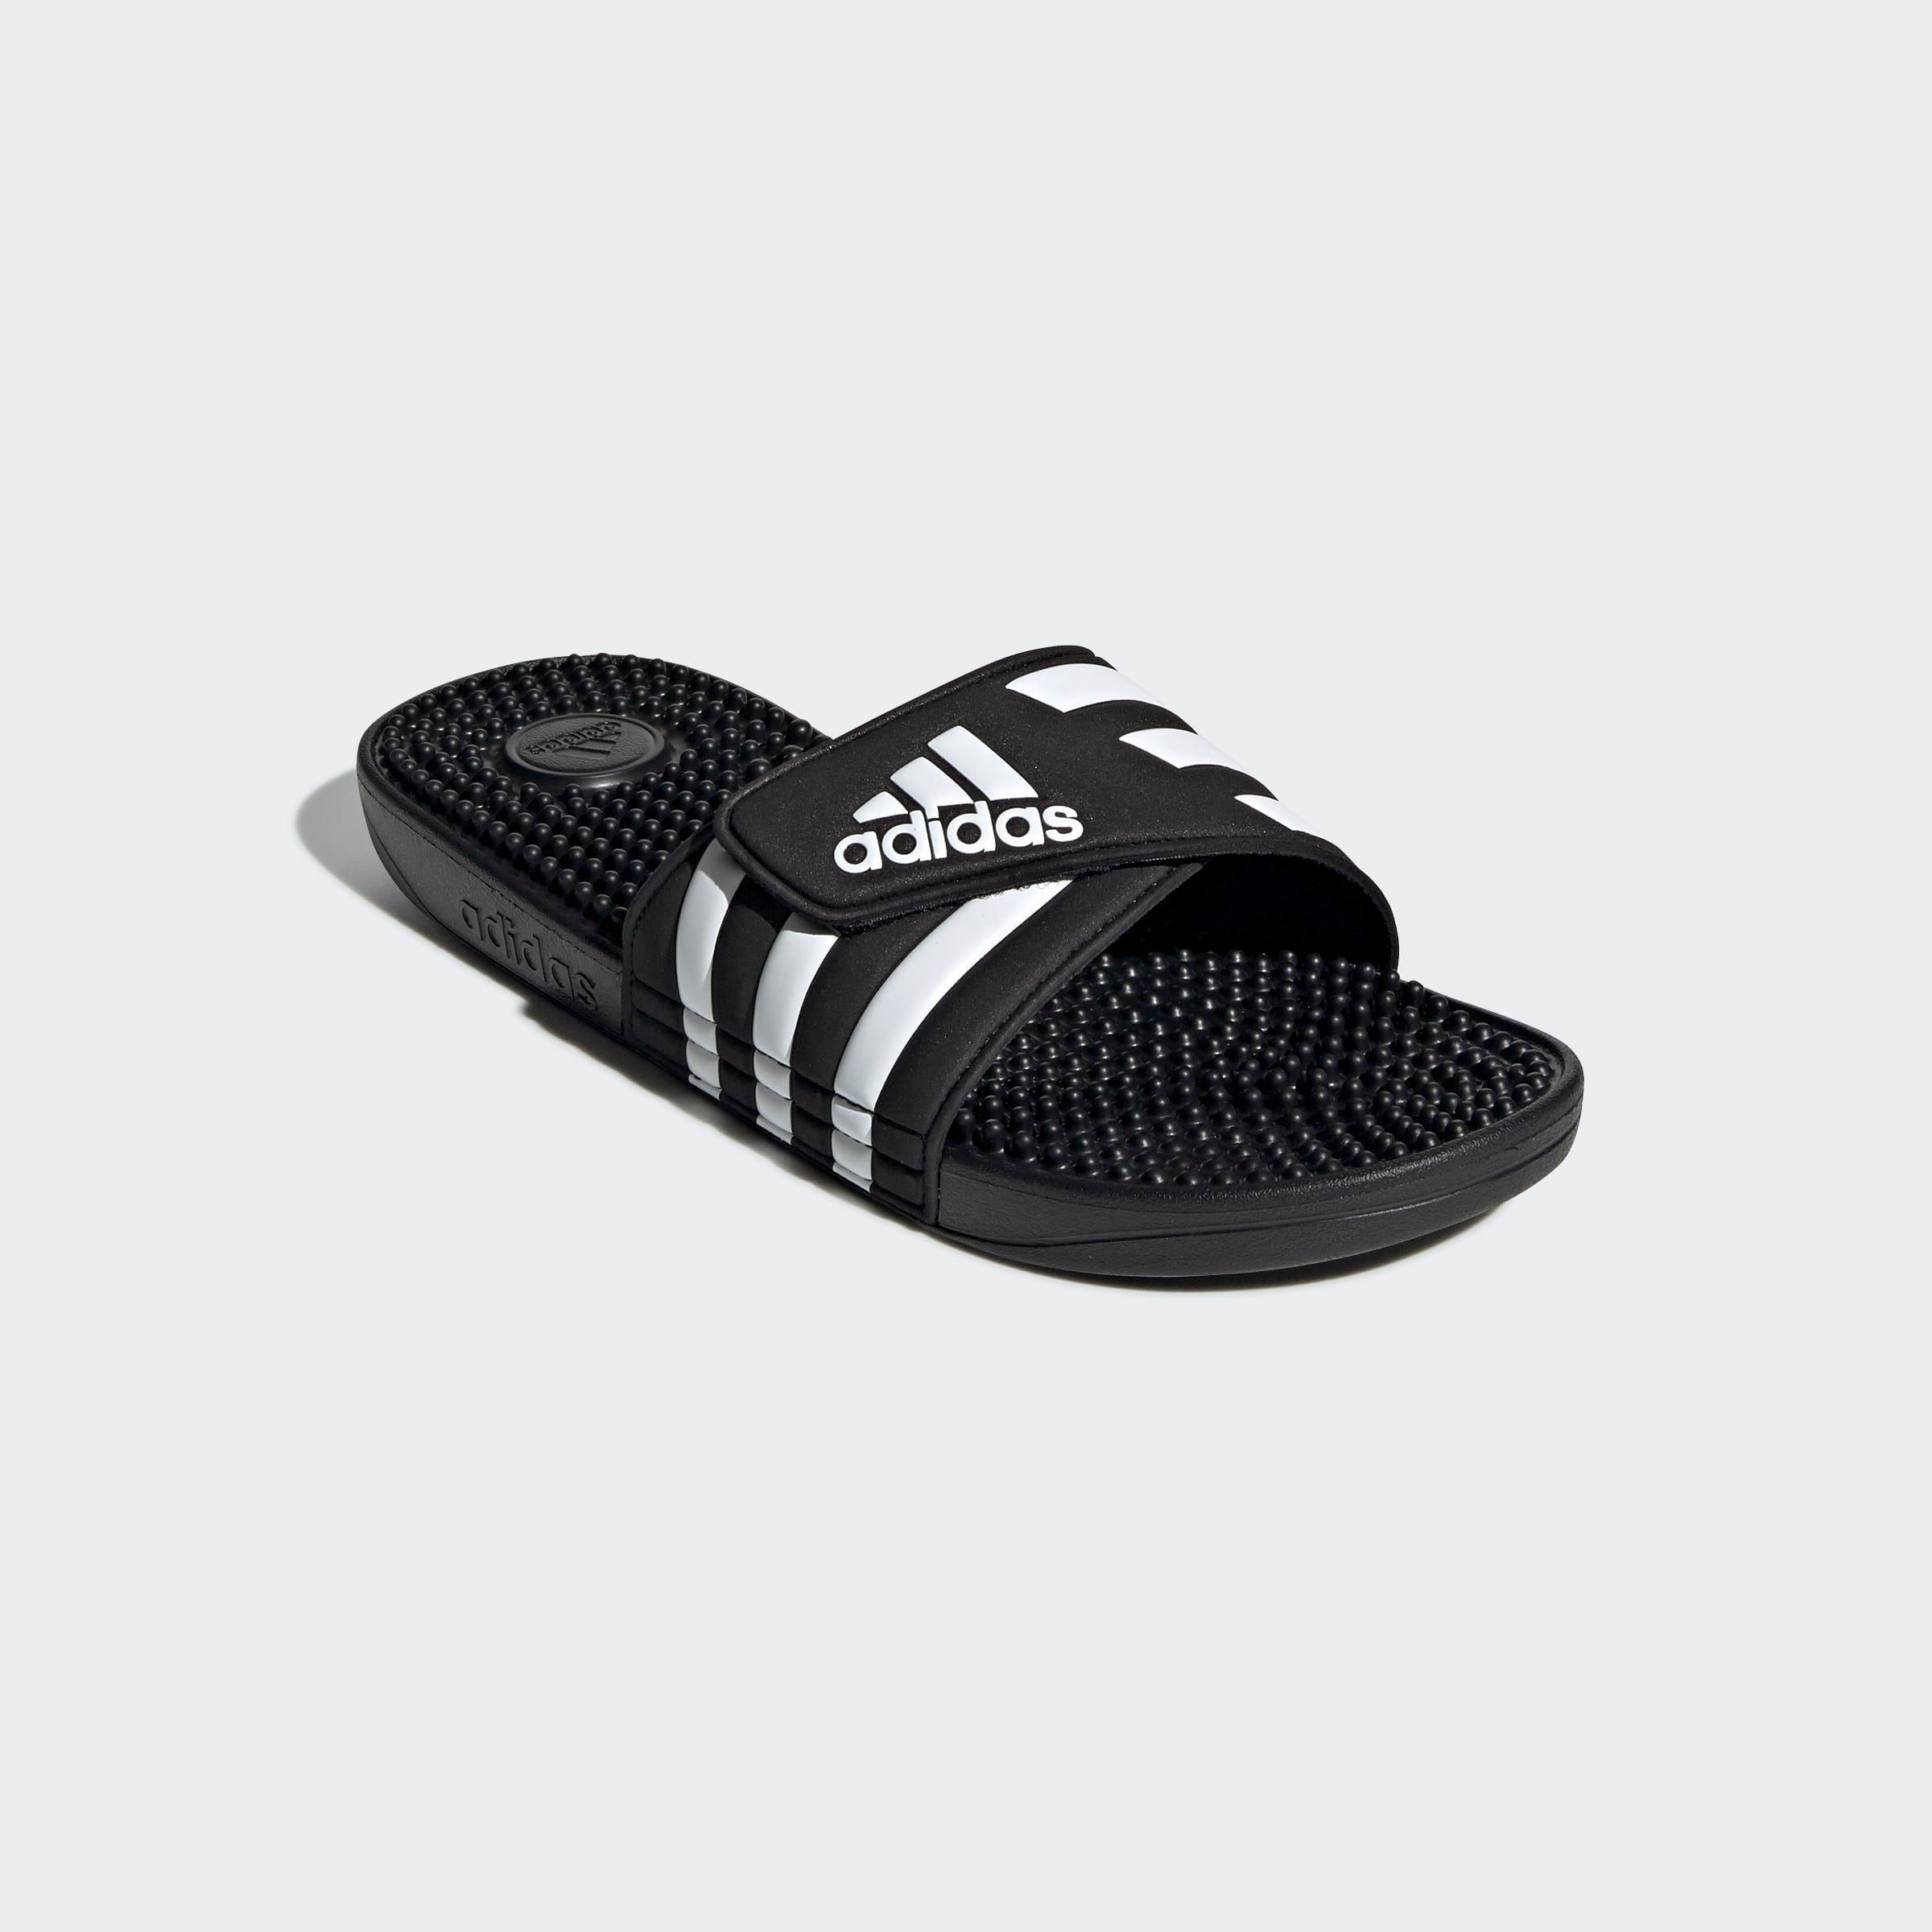 adidas badslippers »Adissage« online kopen op otto.nl